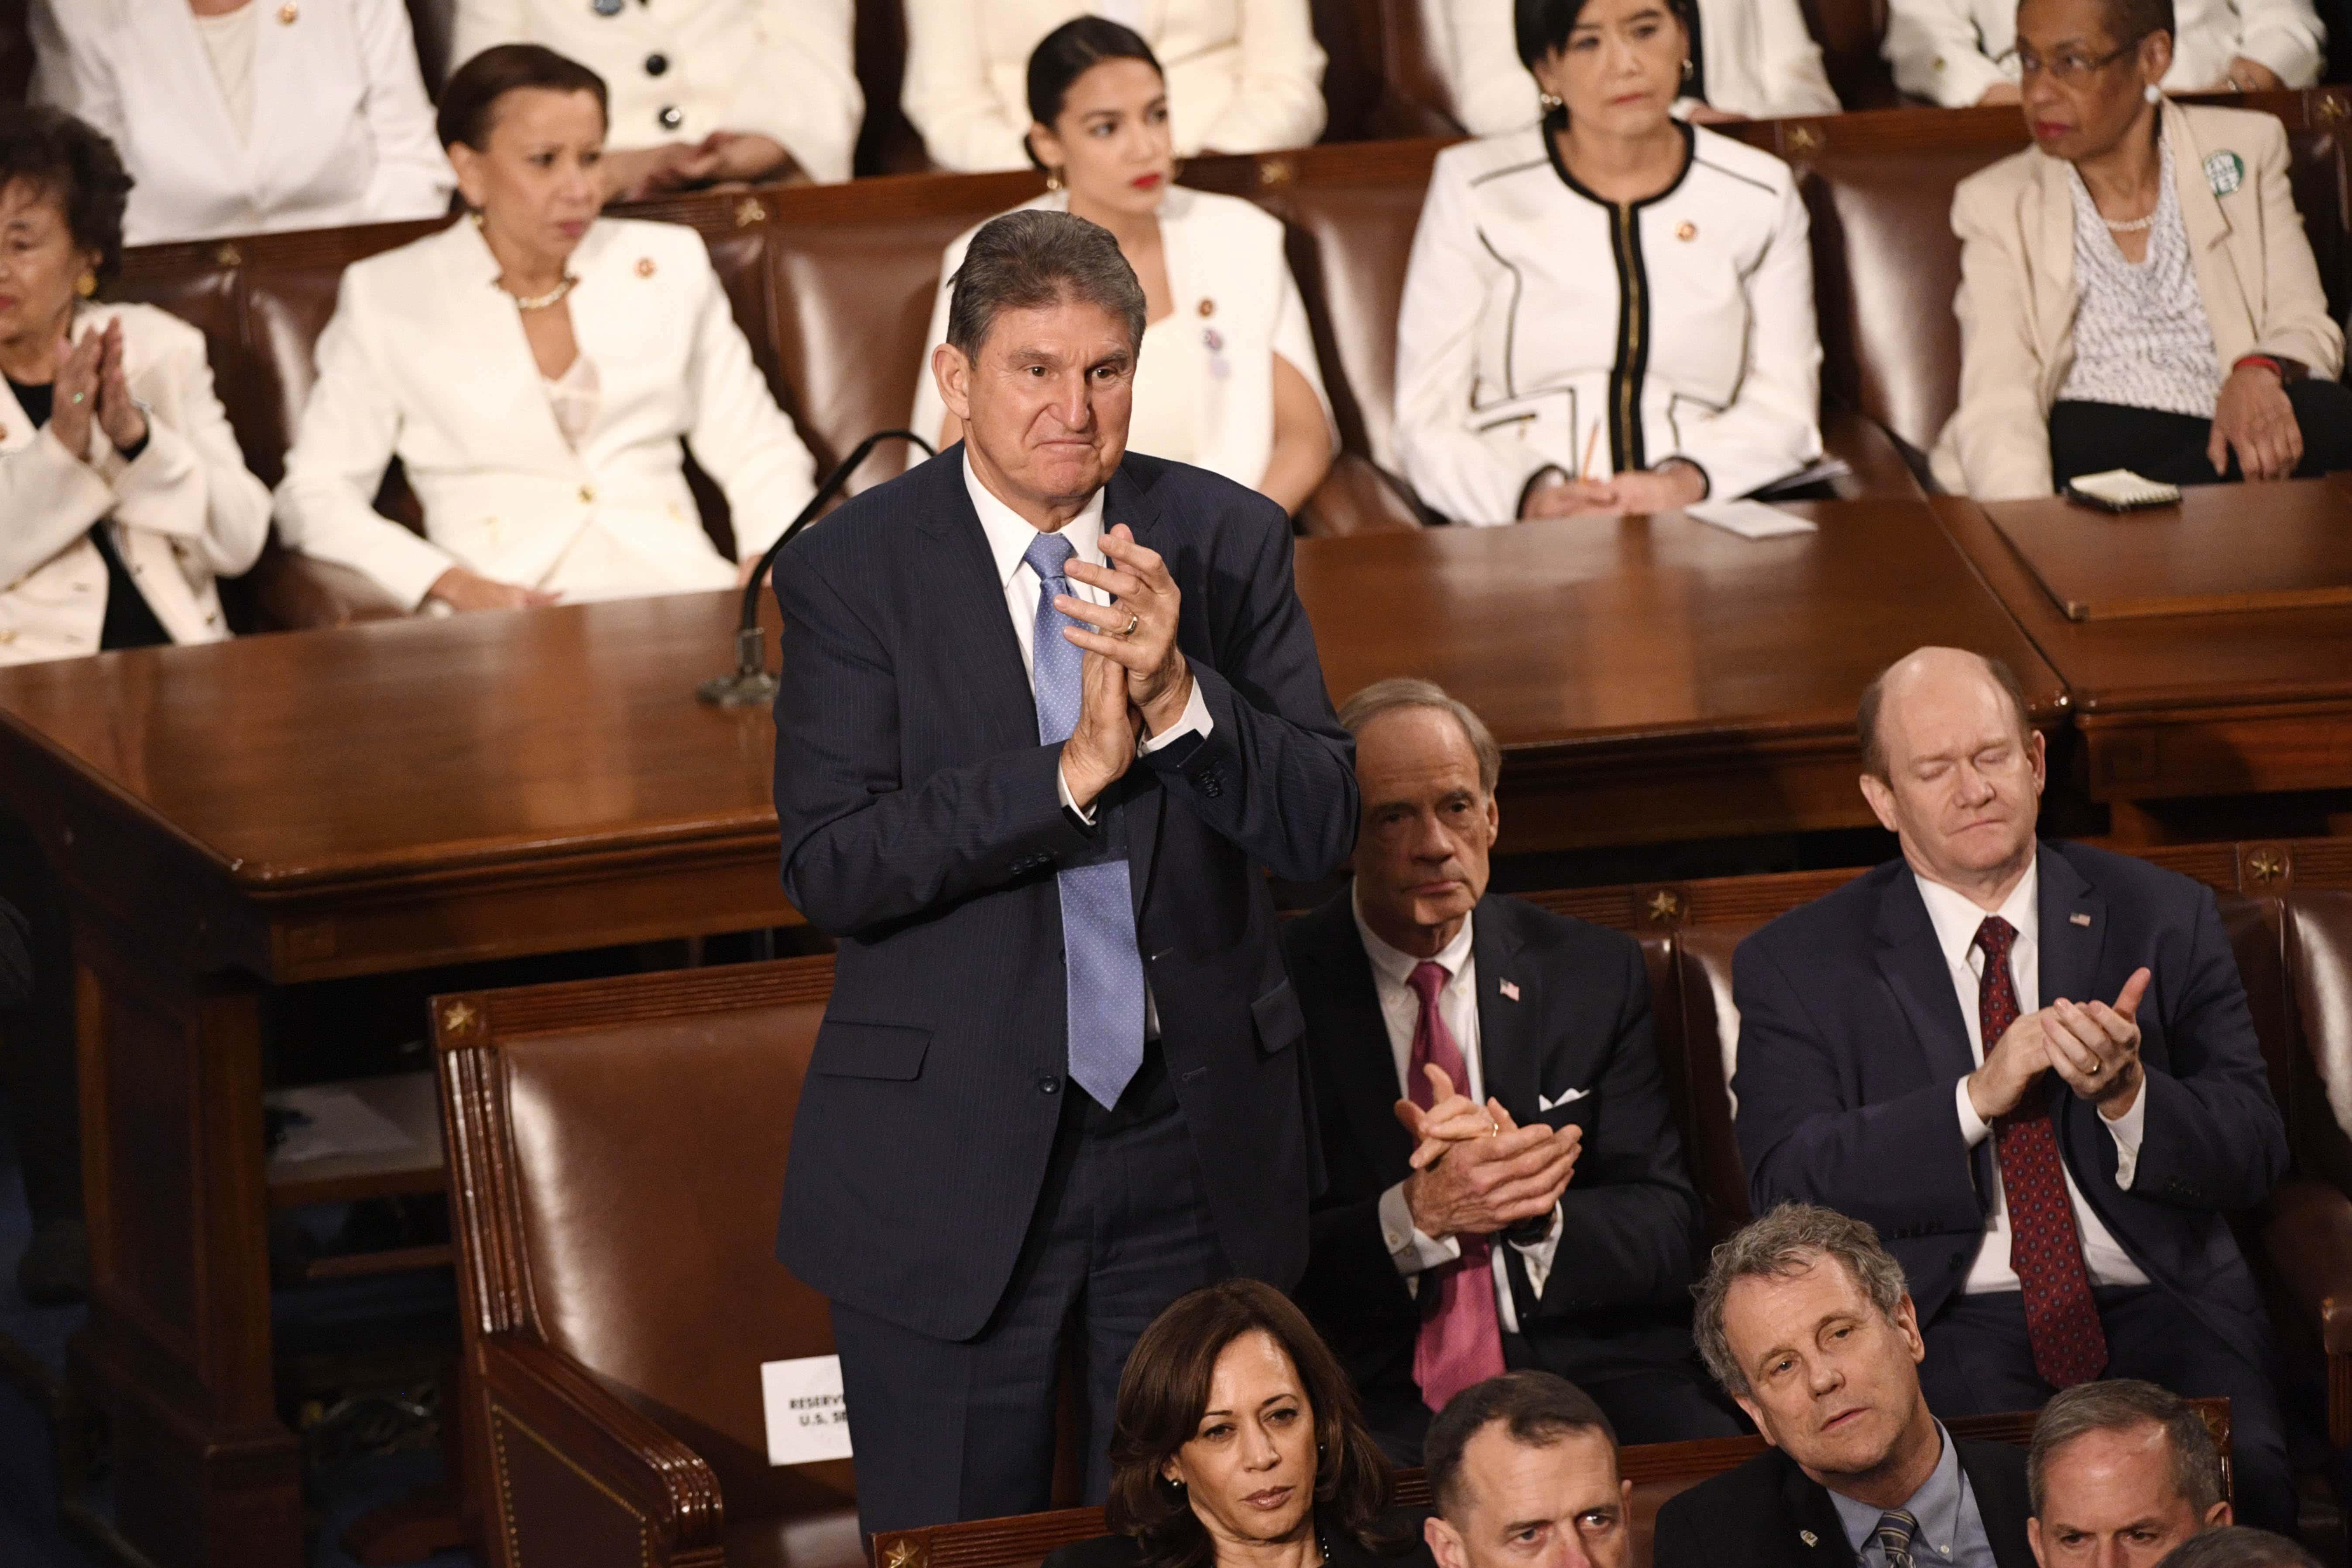 West Virginia Senator Joe Manchin Says He Won't Run For